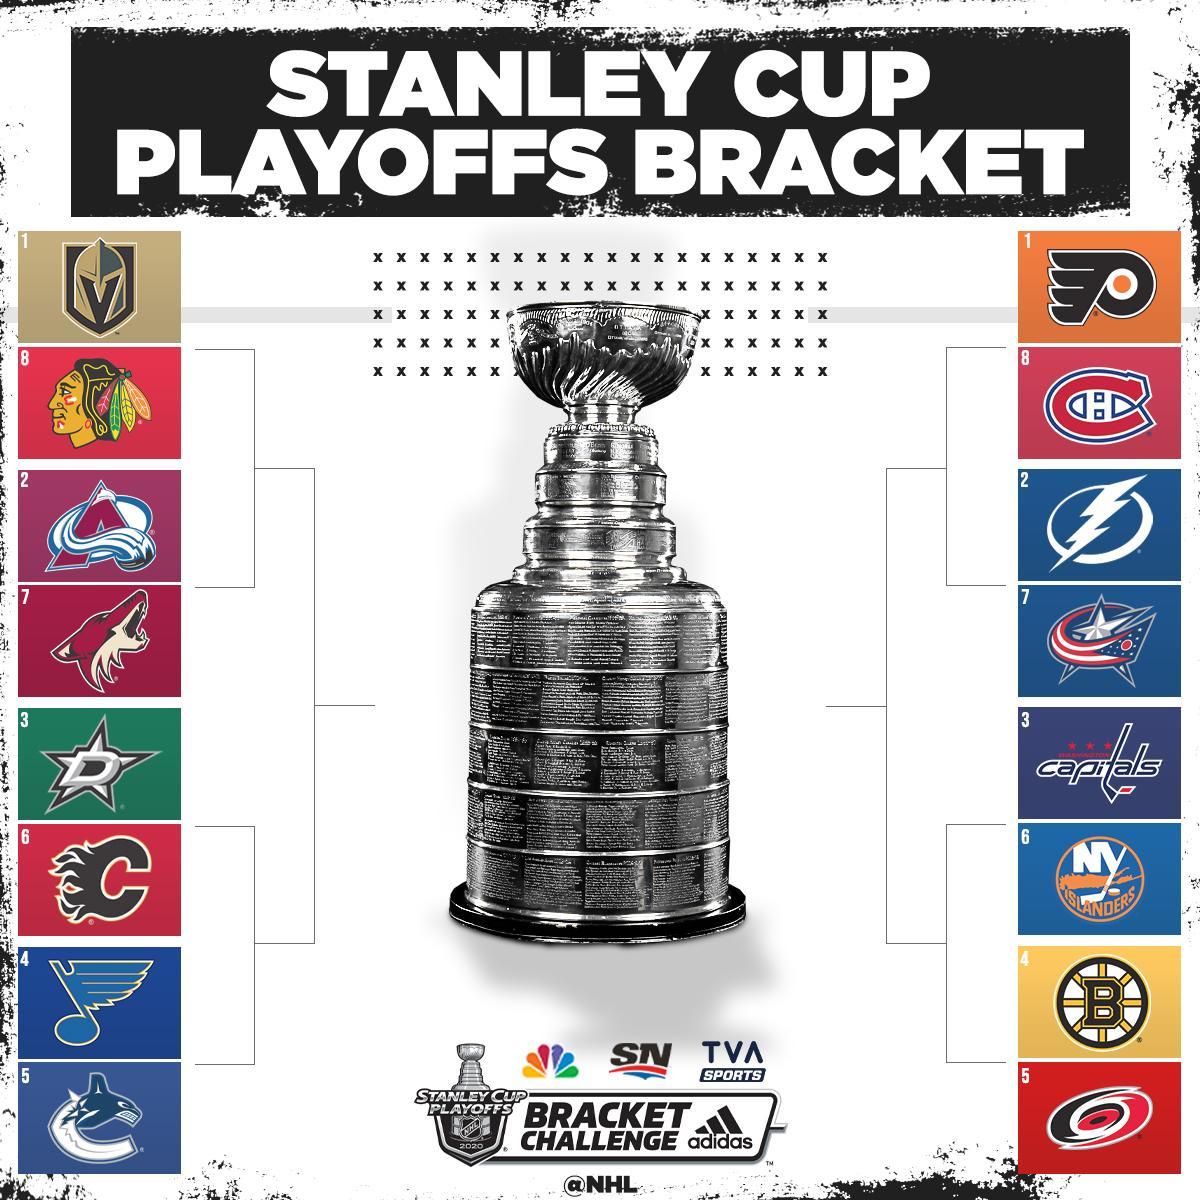 The 2020 #StanleyCup Playoffs bracket is set‼️ https://t.co/IQPSlETG6Y